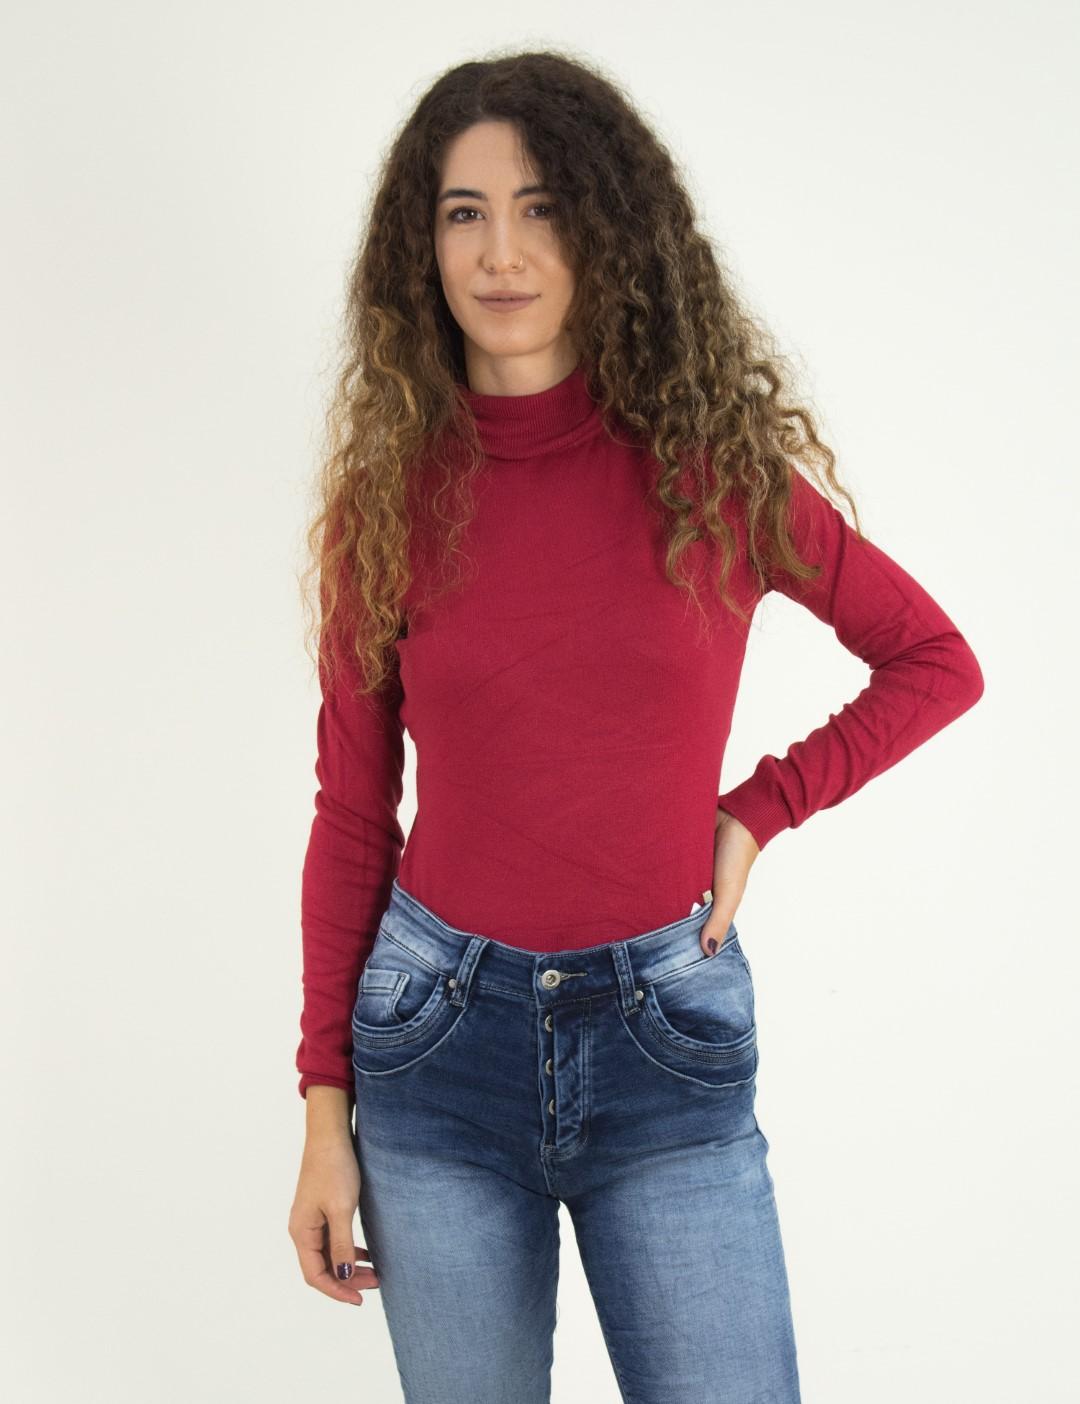 5f6de6017719 Torouxo Γυναικείο κόκκινο πουλόβερ ζιβάγκο μονόχρωμο MX3009D